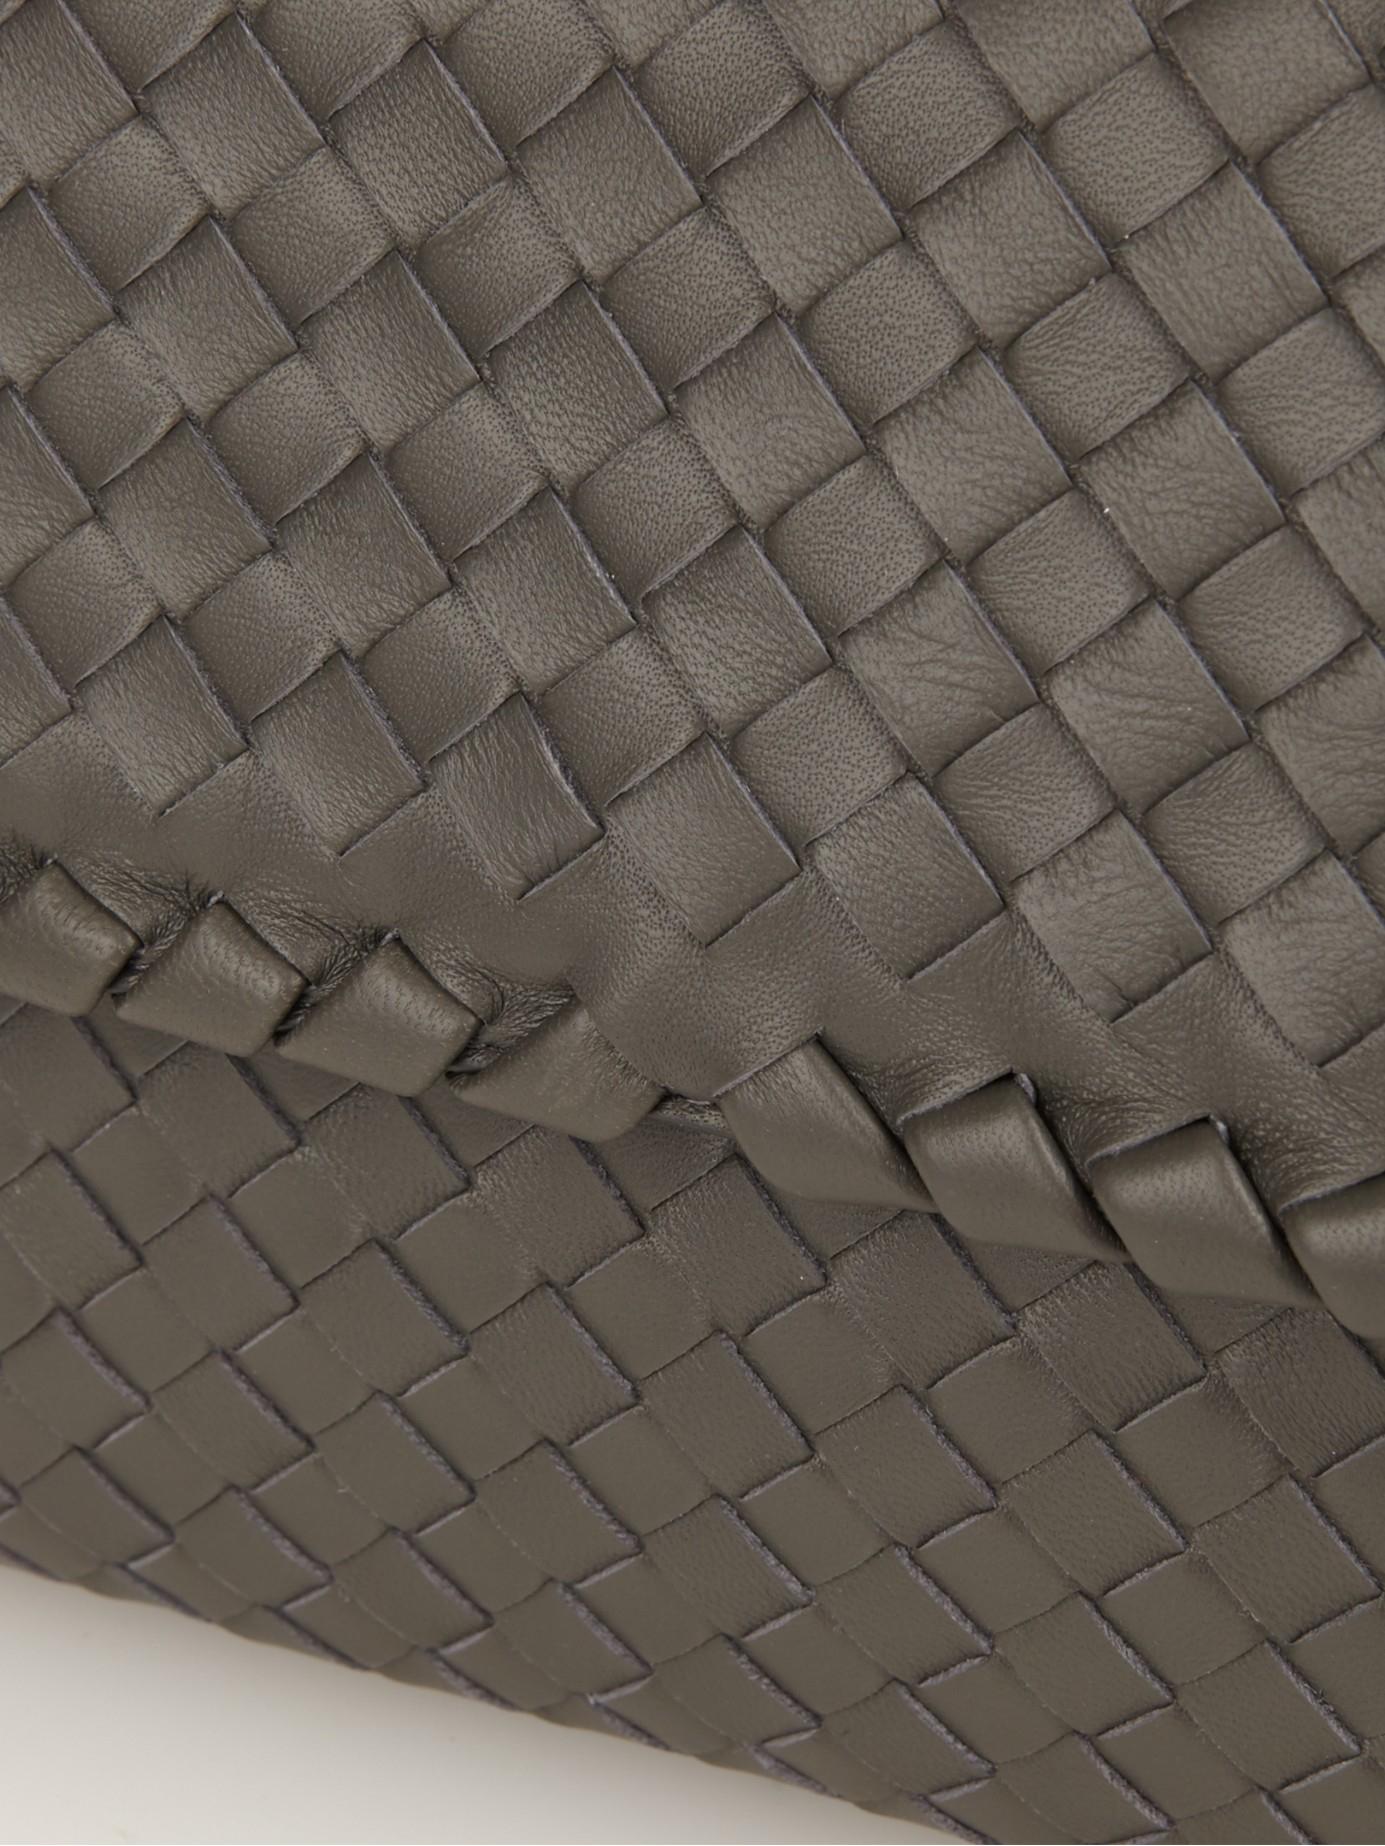 b08bc8689ade Bottega veneta Olimpia Small Intrecciato Leather Shoulder Bag in .